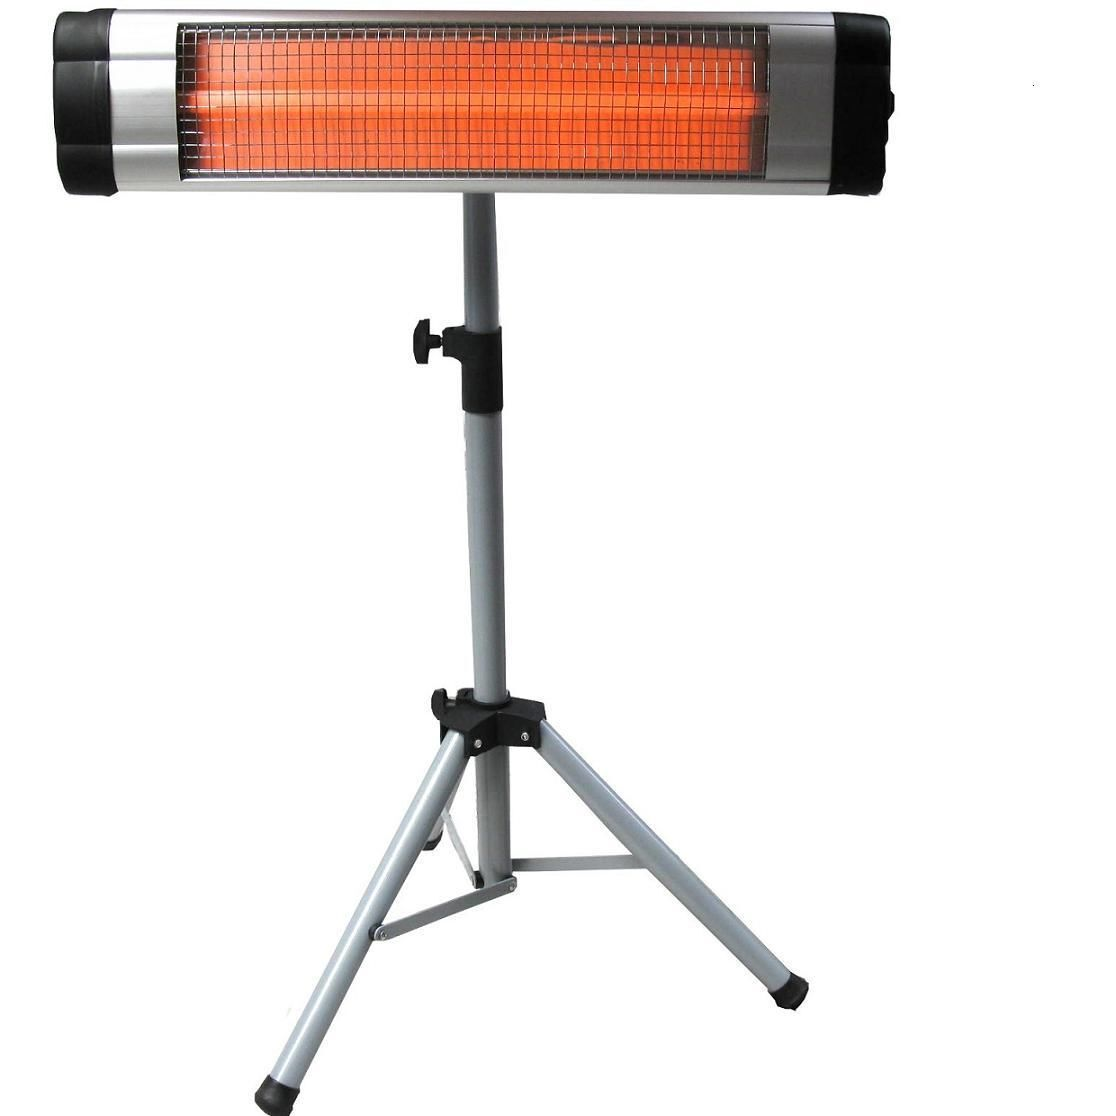 infrarotstrahler fernbedienung infrarotheizstrahler terassen heiz strahler funk eur 39 98. Black Bedroom Furniture Sets. Home Design Ideas